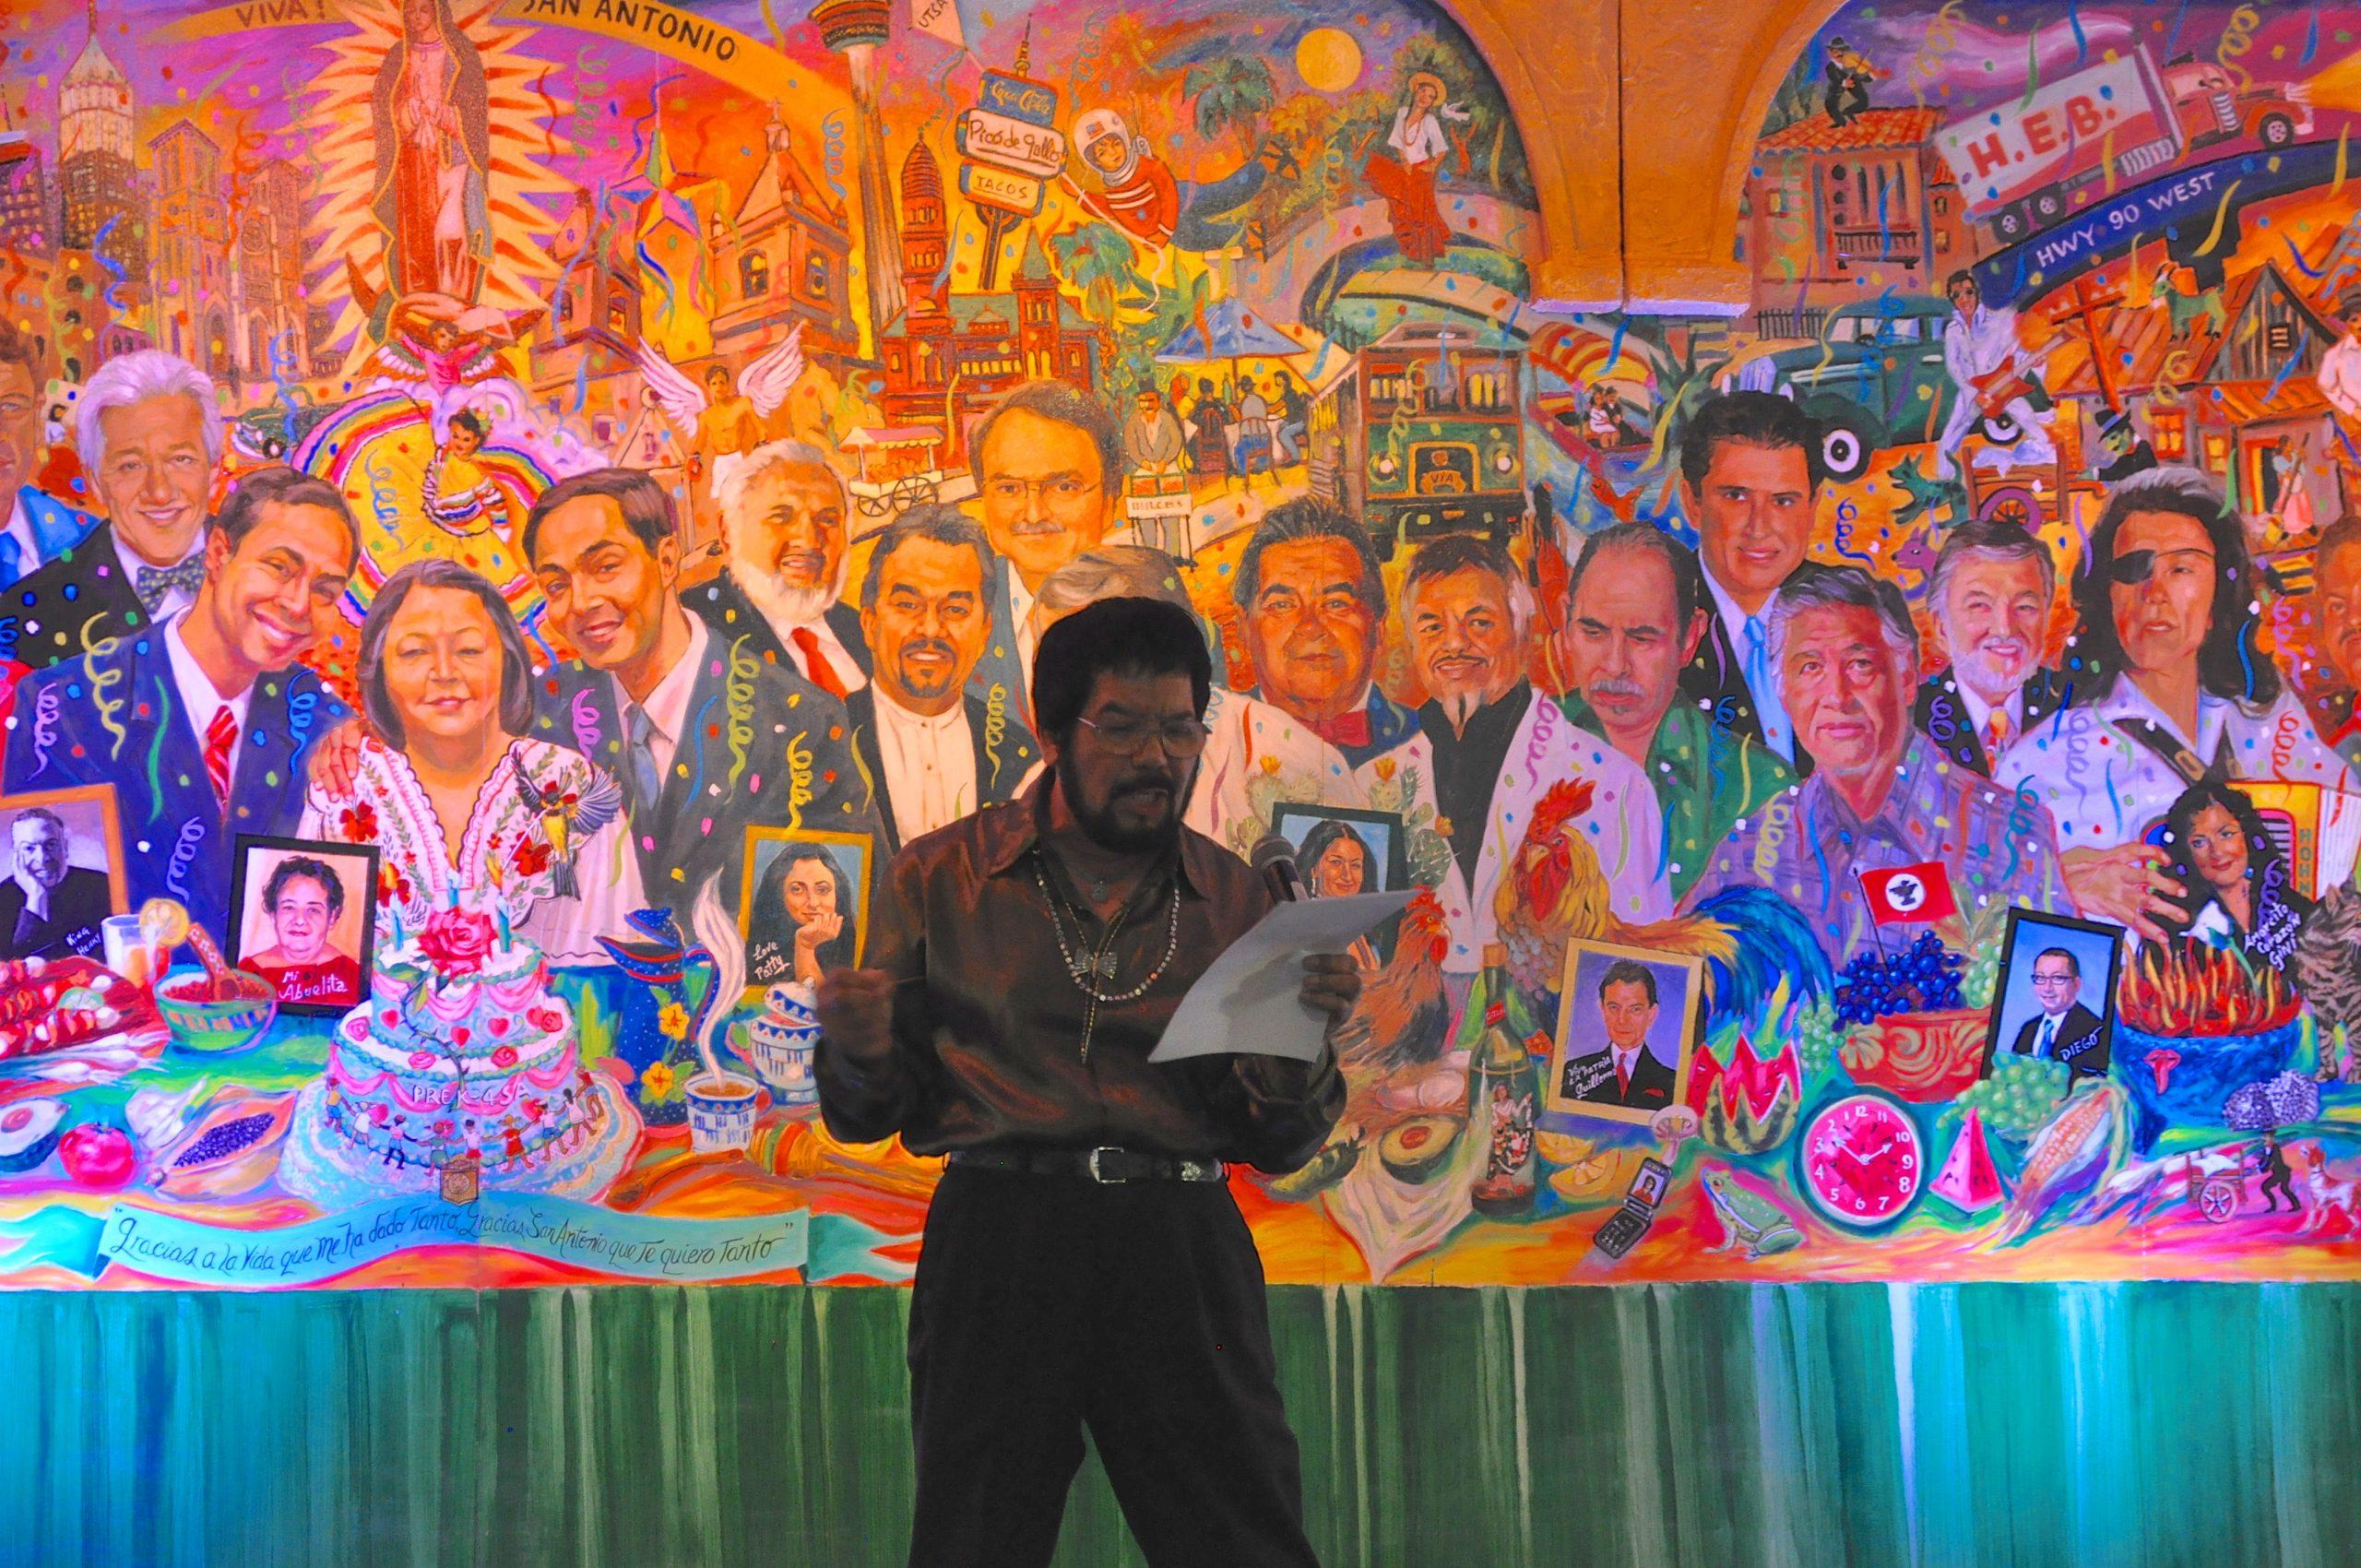 Poet and artist Neftalí de Leon performs his new poem.